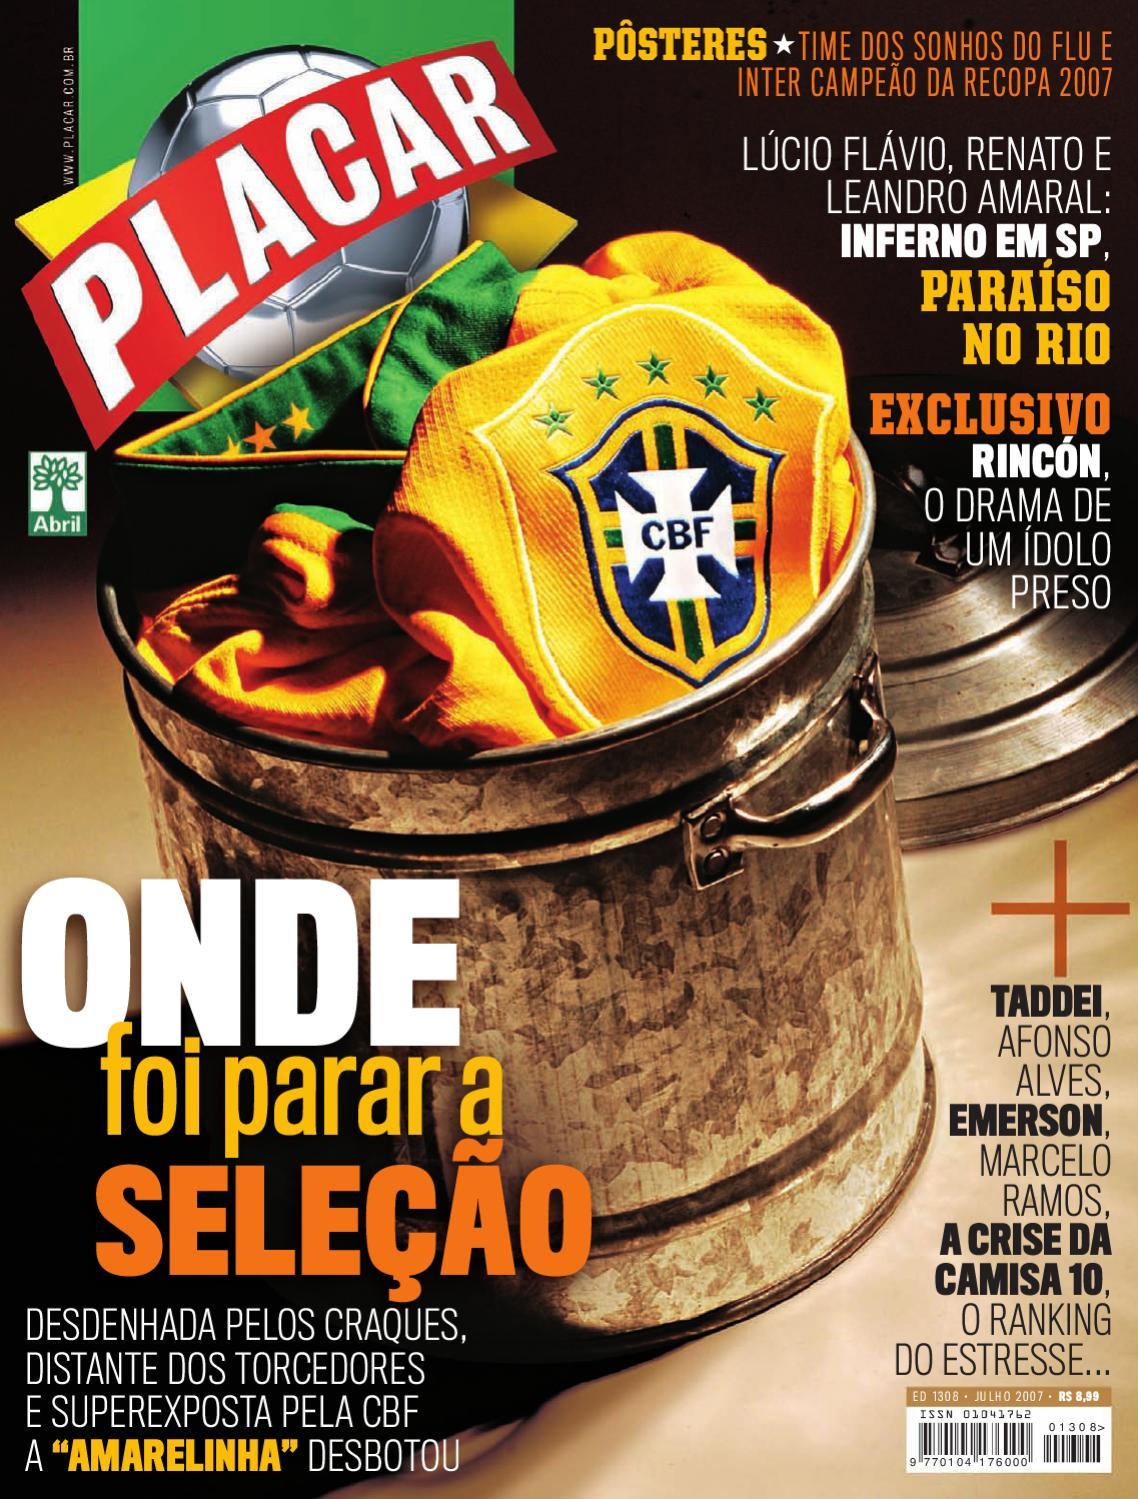 02f3d0b0d798d Placar Julho 2007 by Revista Placar - issuu